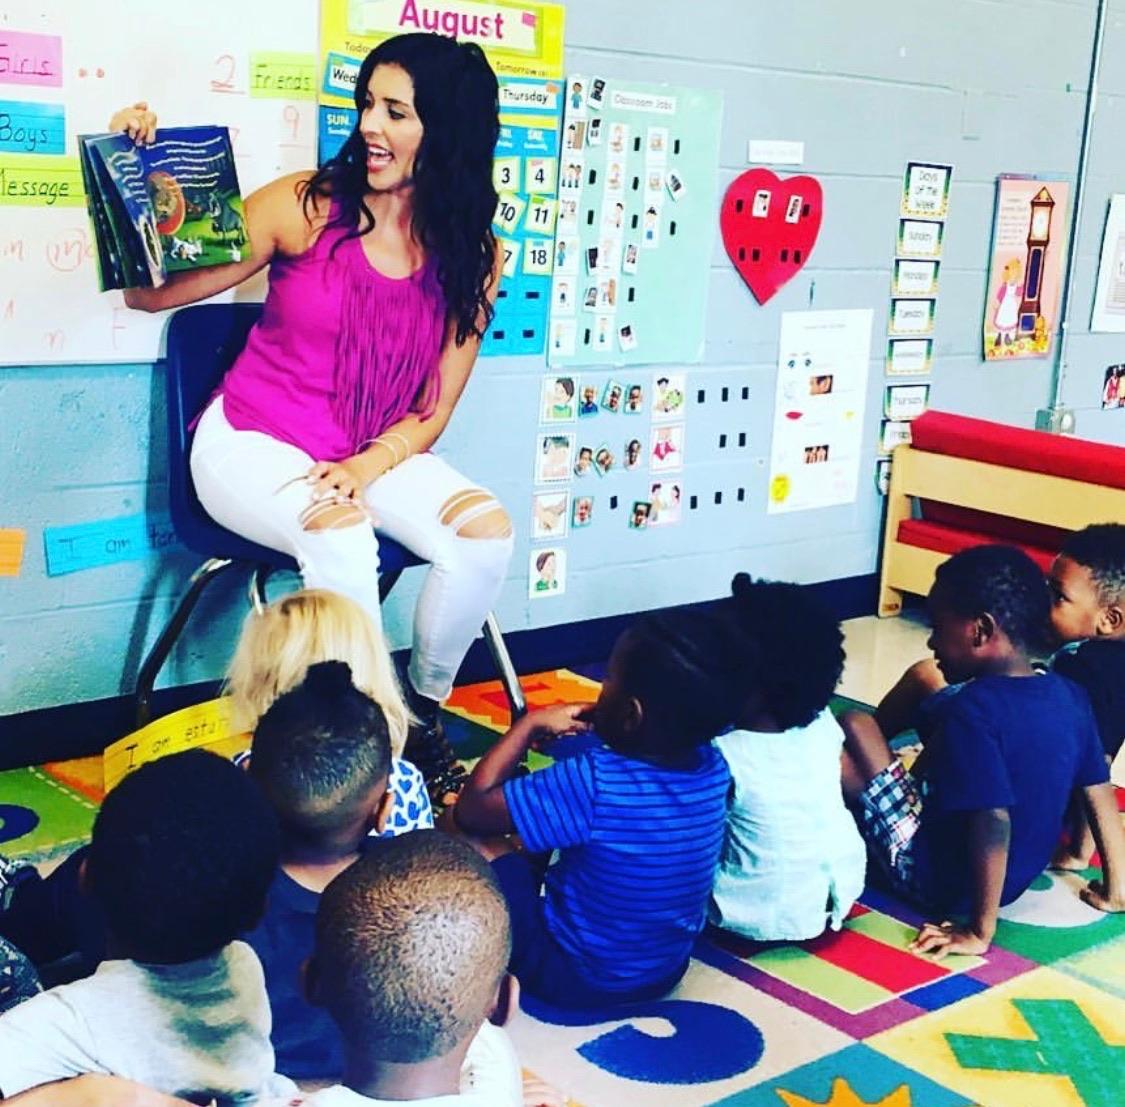 Crystal reading her children's book Mason the Bull